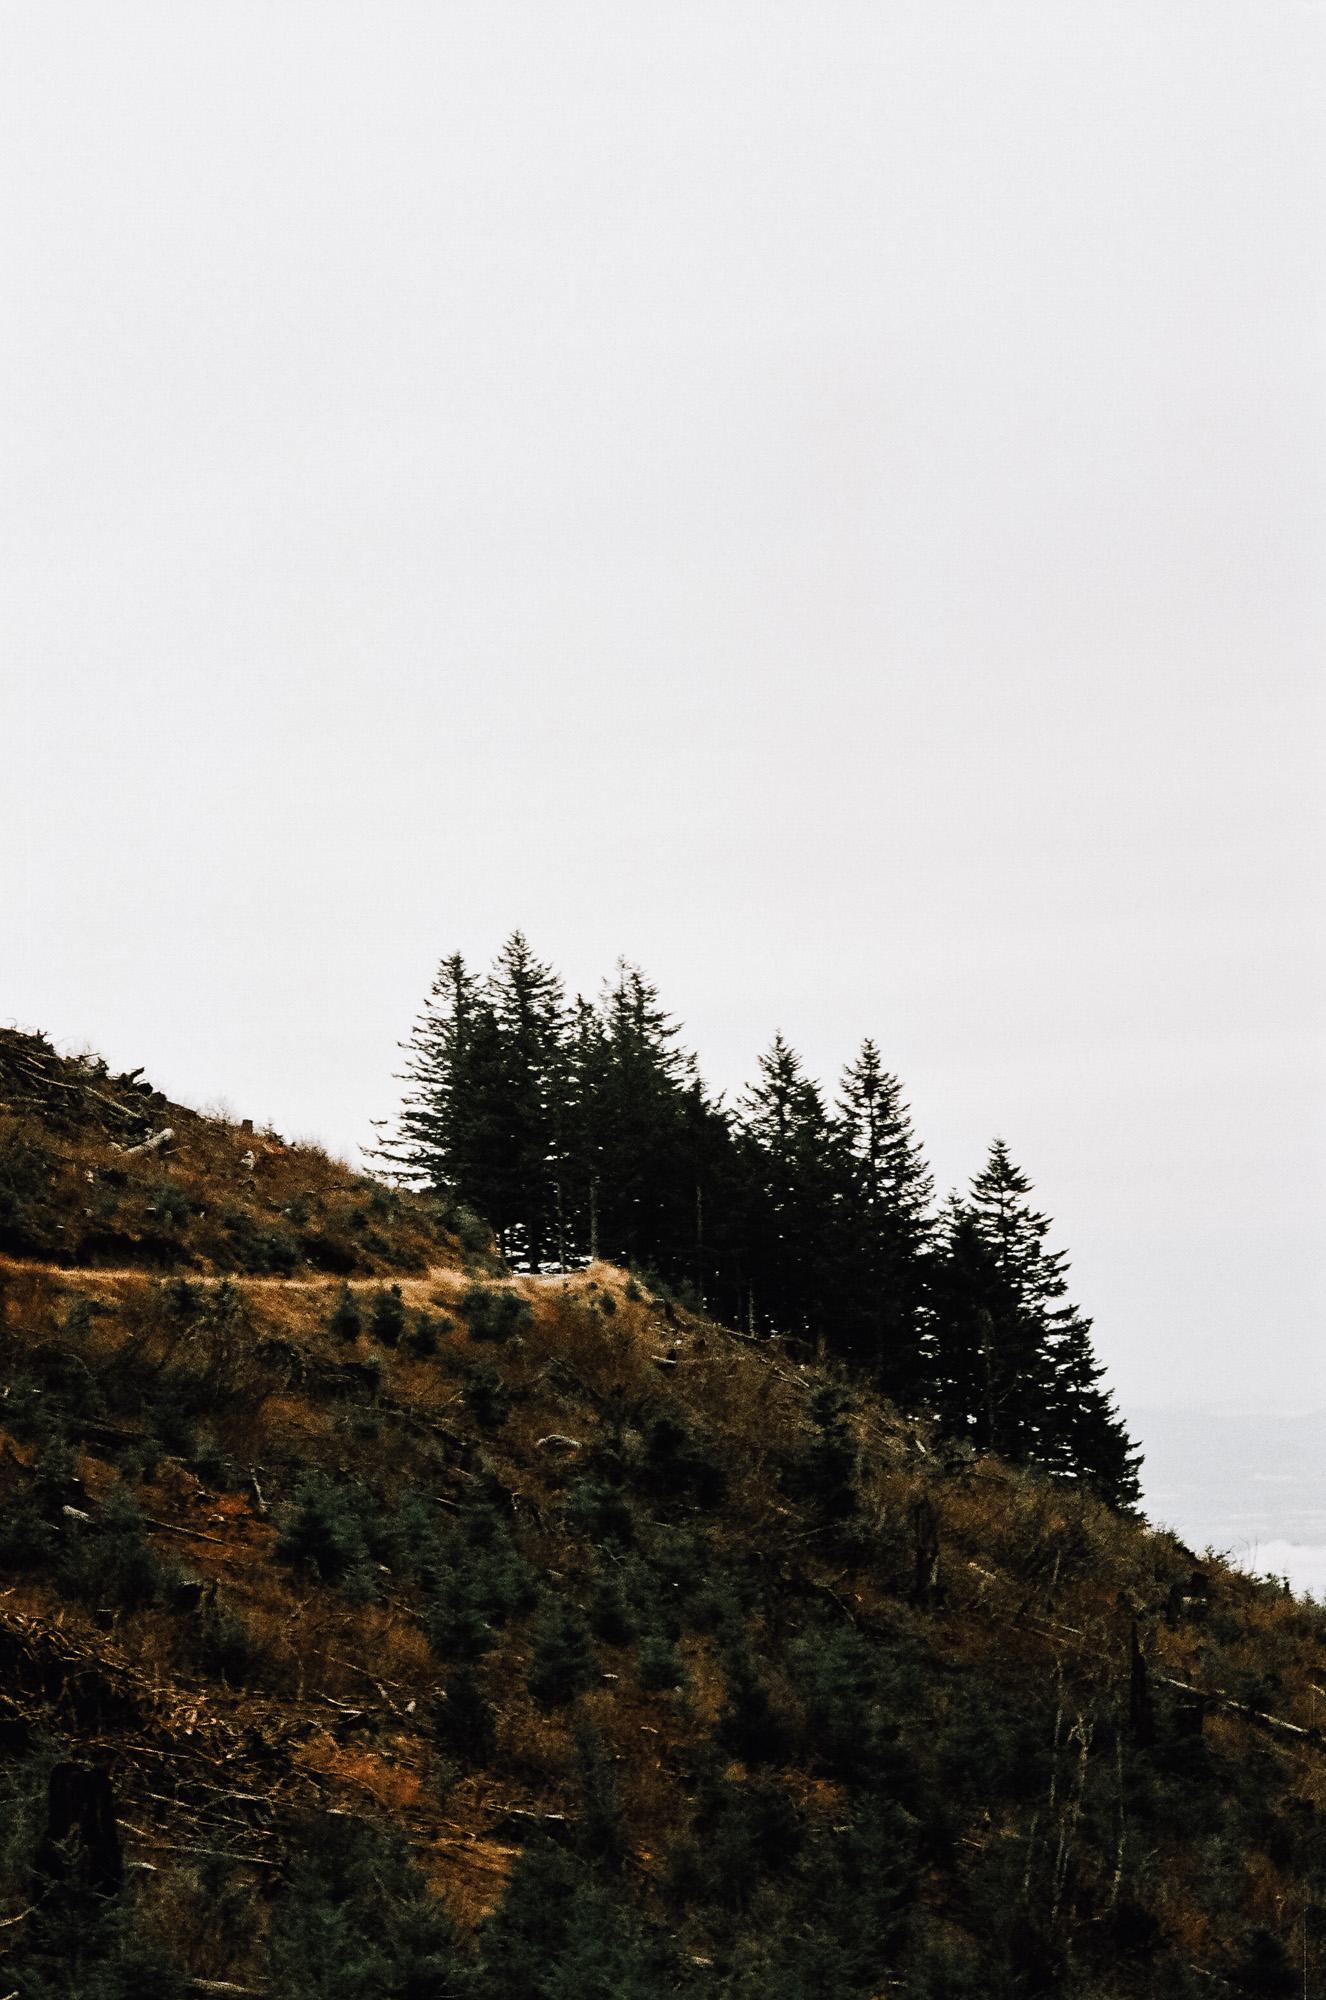 Livingston Mountain Camas Washington KyleWillisPhoto Agfa Vista 400 35mm Film Nikkormat FT2